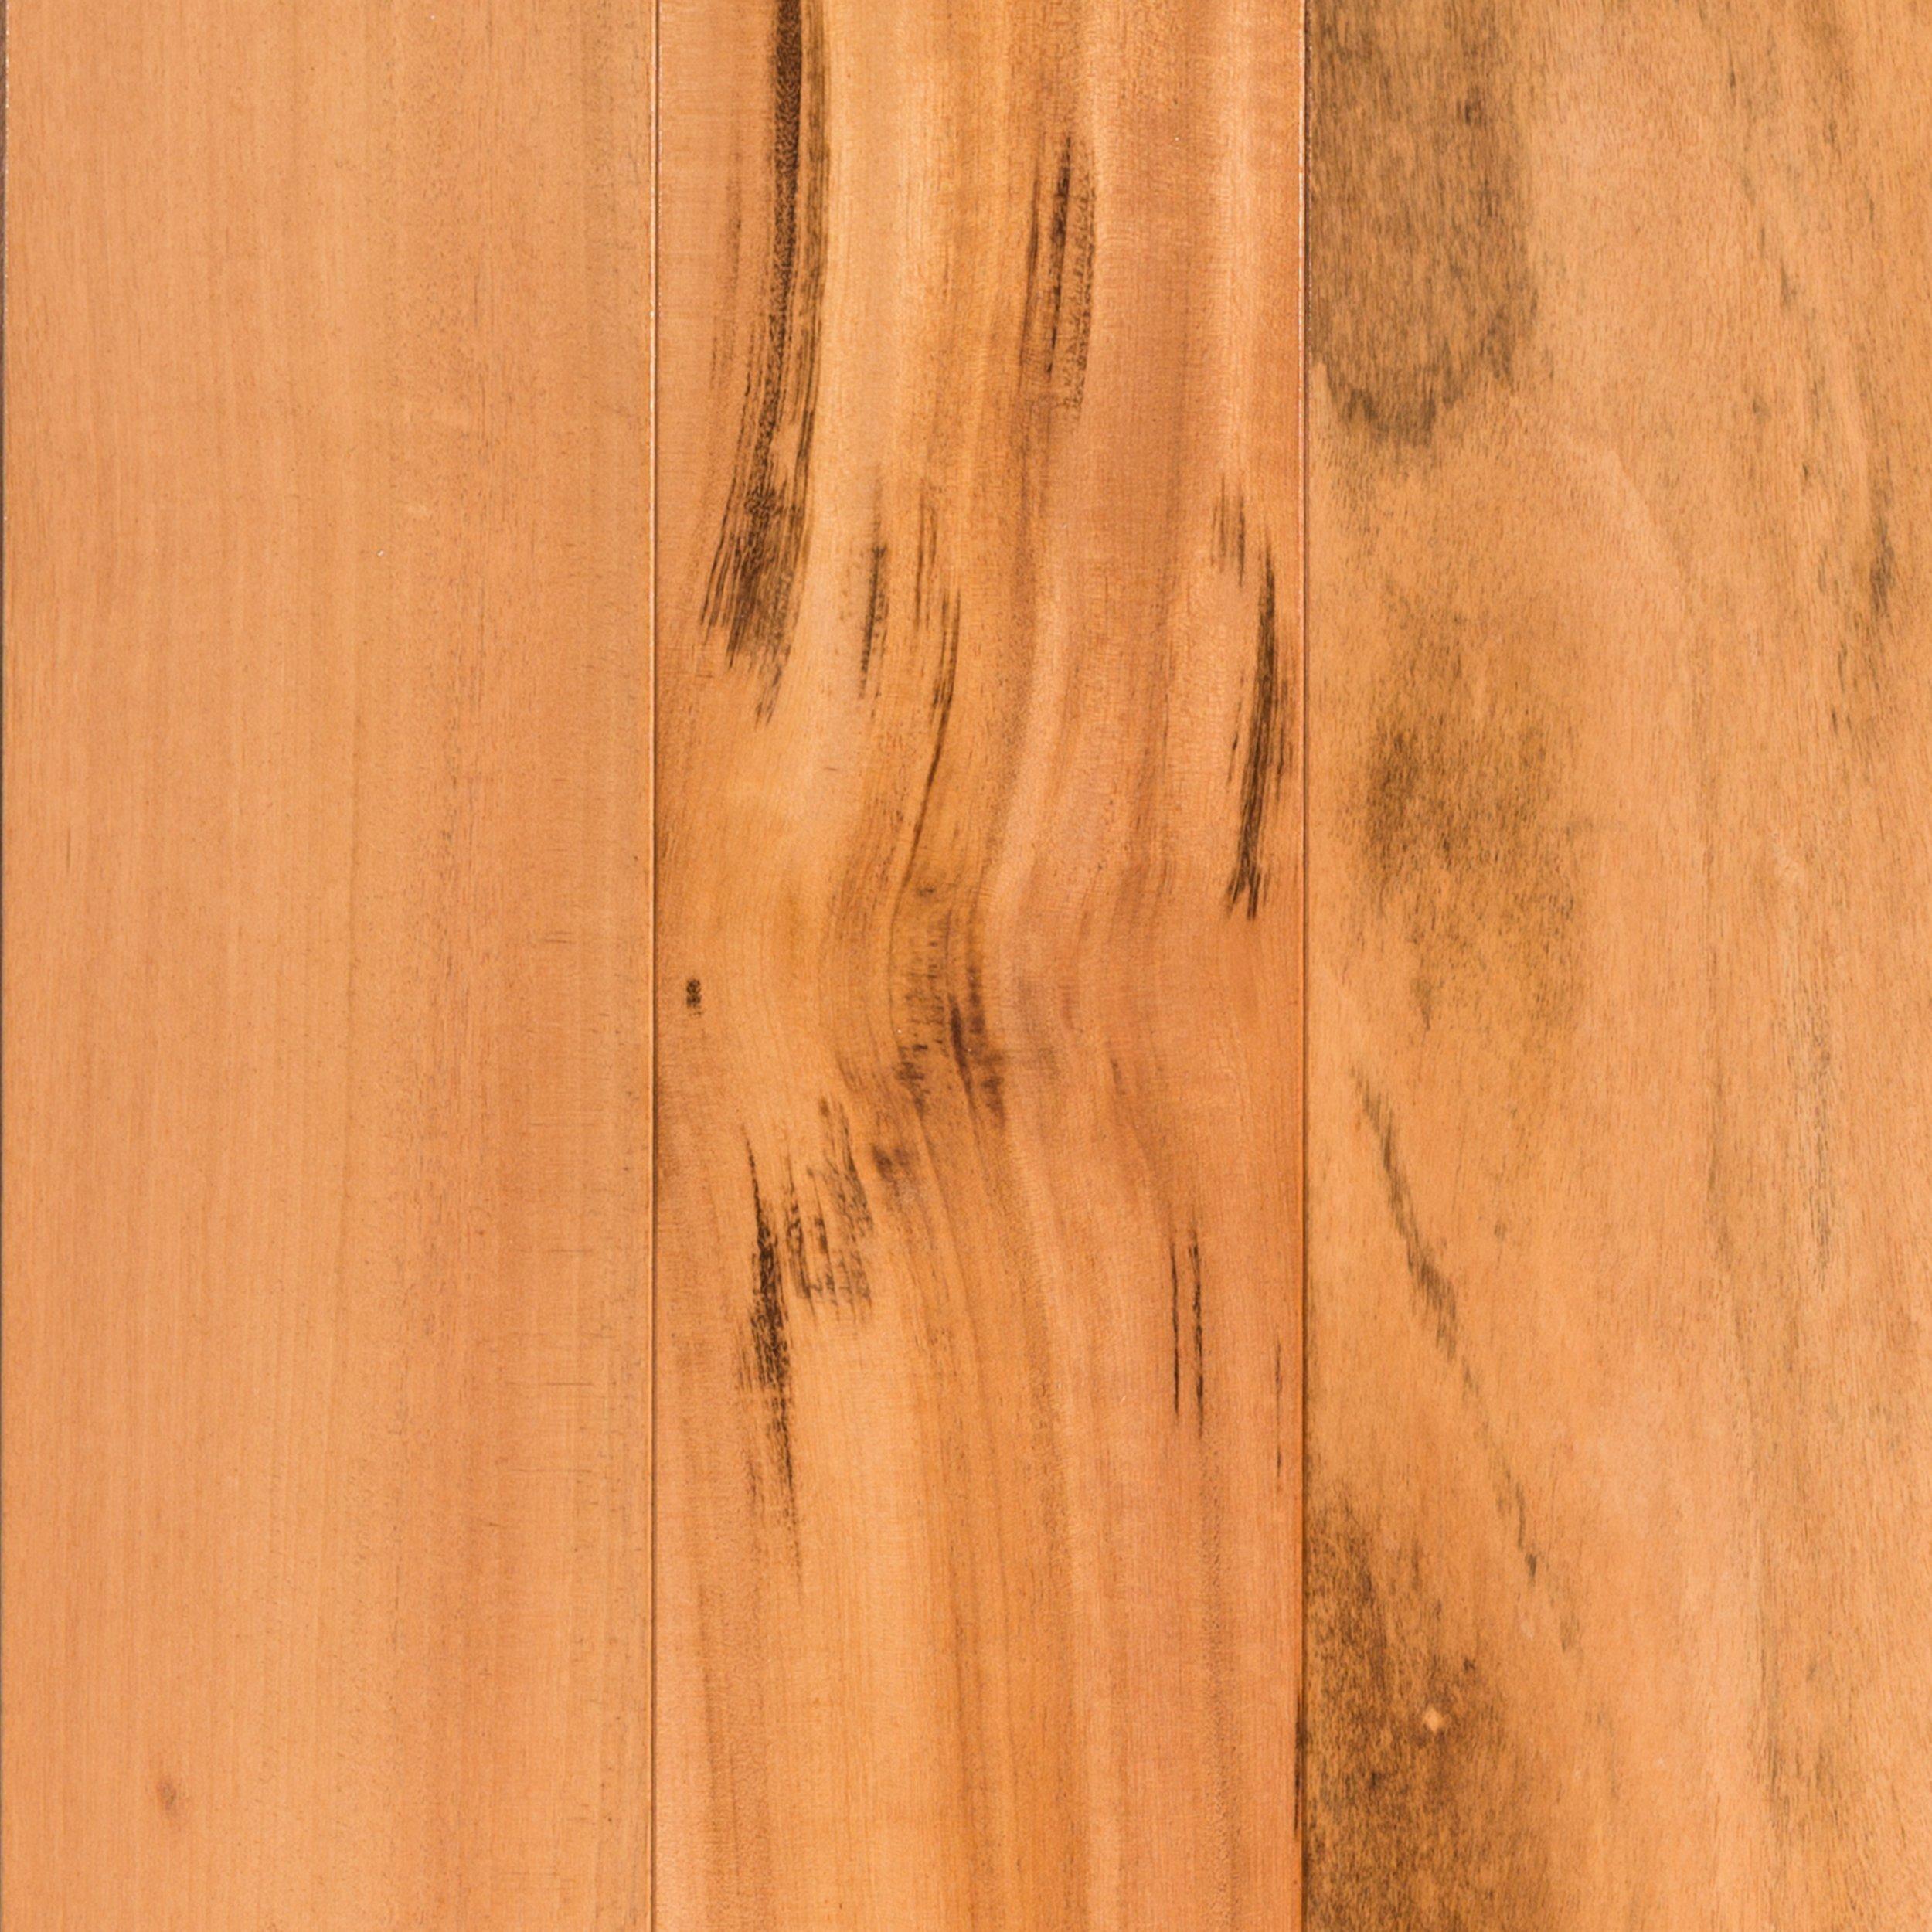 Brazilian Tigerwood Natural Solid Hardwood Floor Decor In 2020 Solid Hardwood Floors Solid Hardwood Hardwood